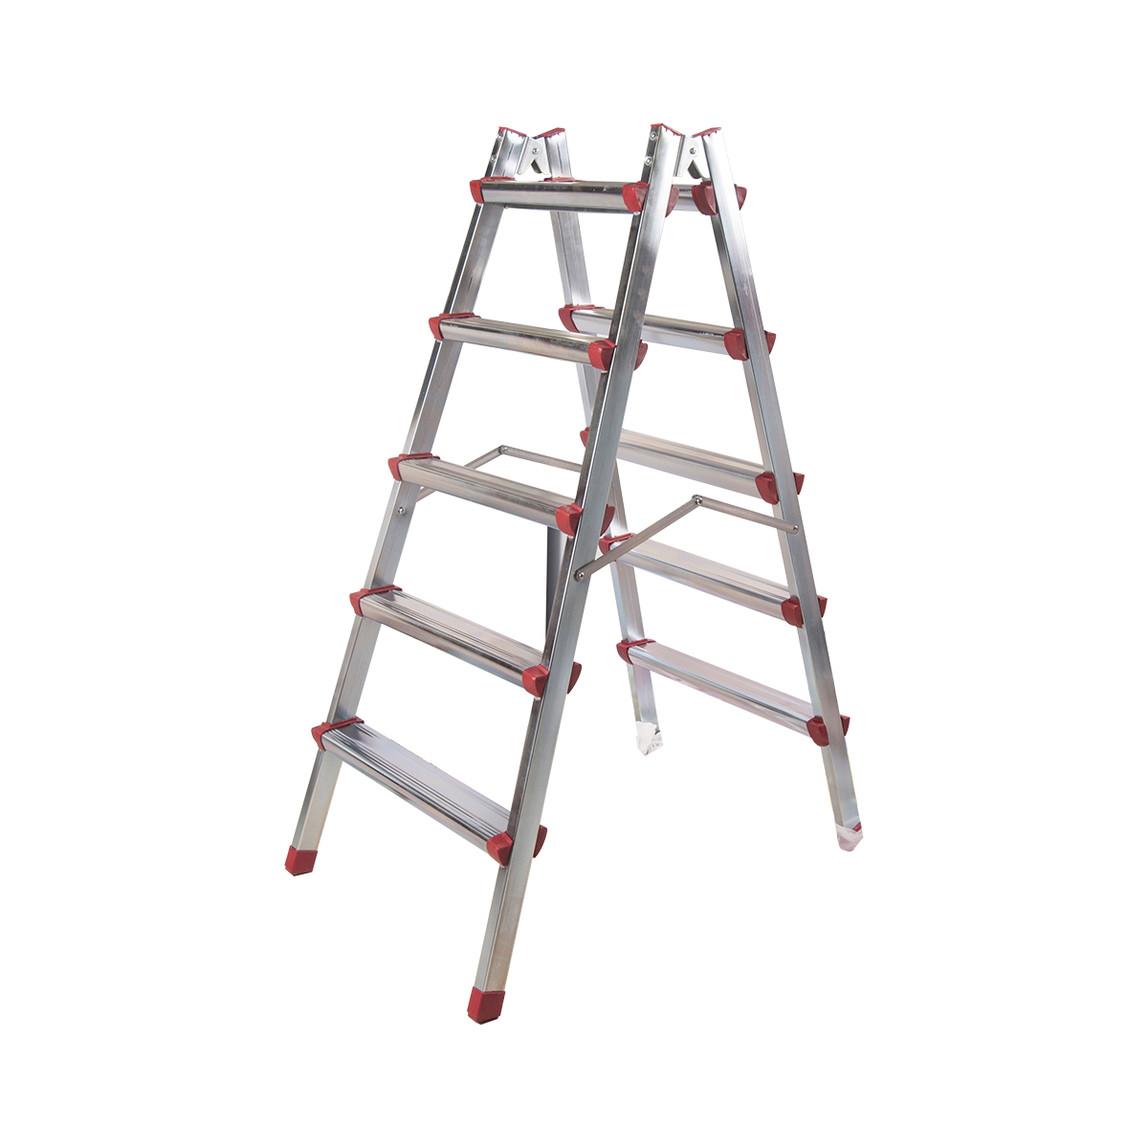 Evin New Ağrı 5x2 Çift Basamaklı Merdiven